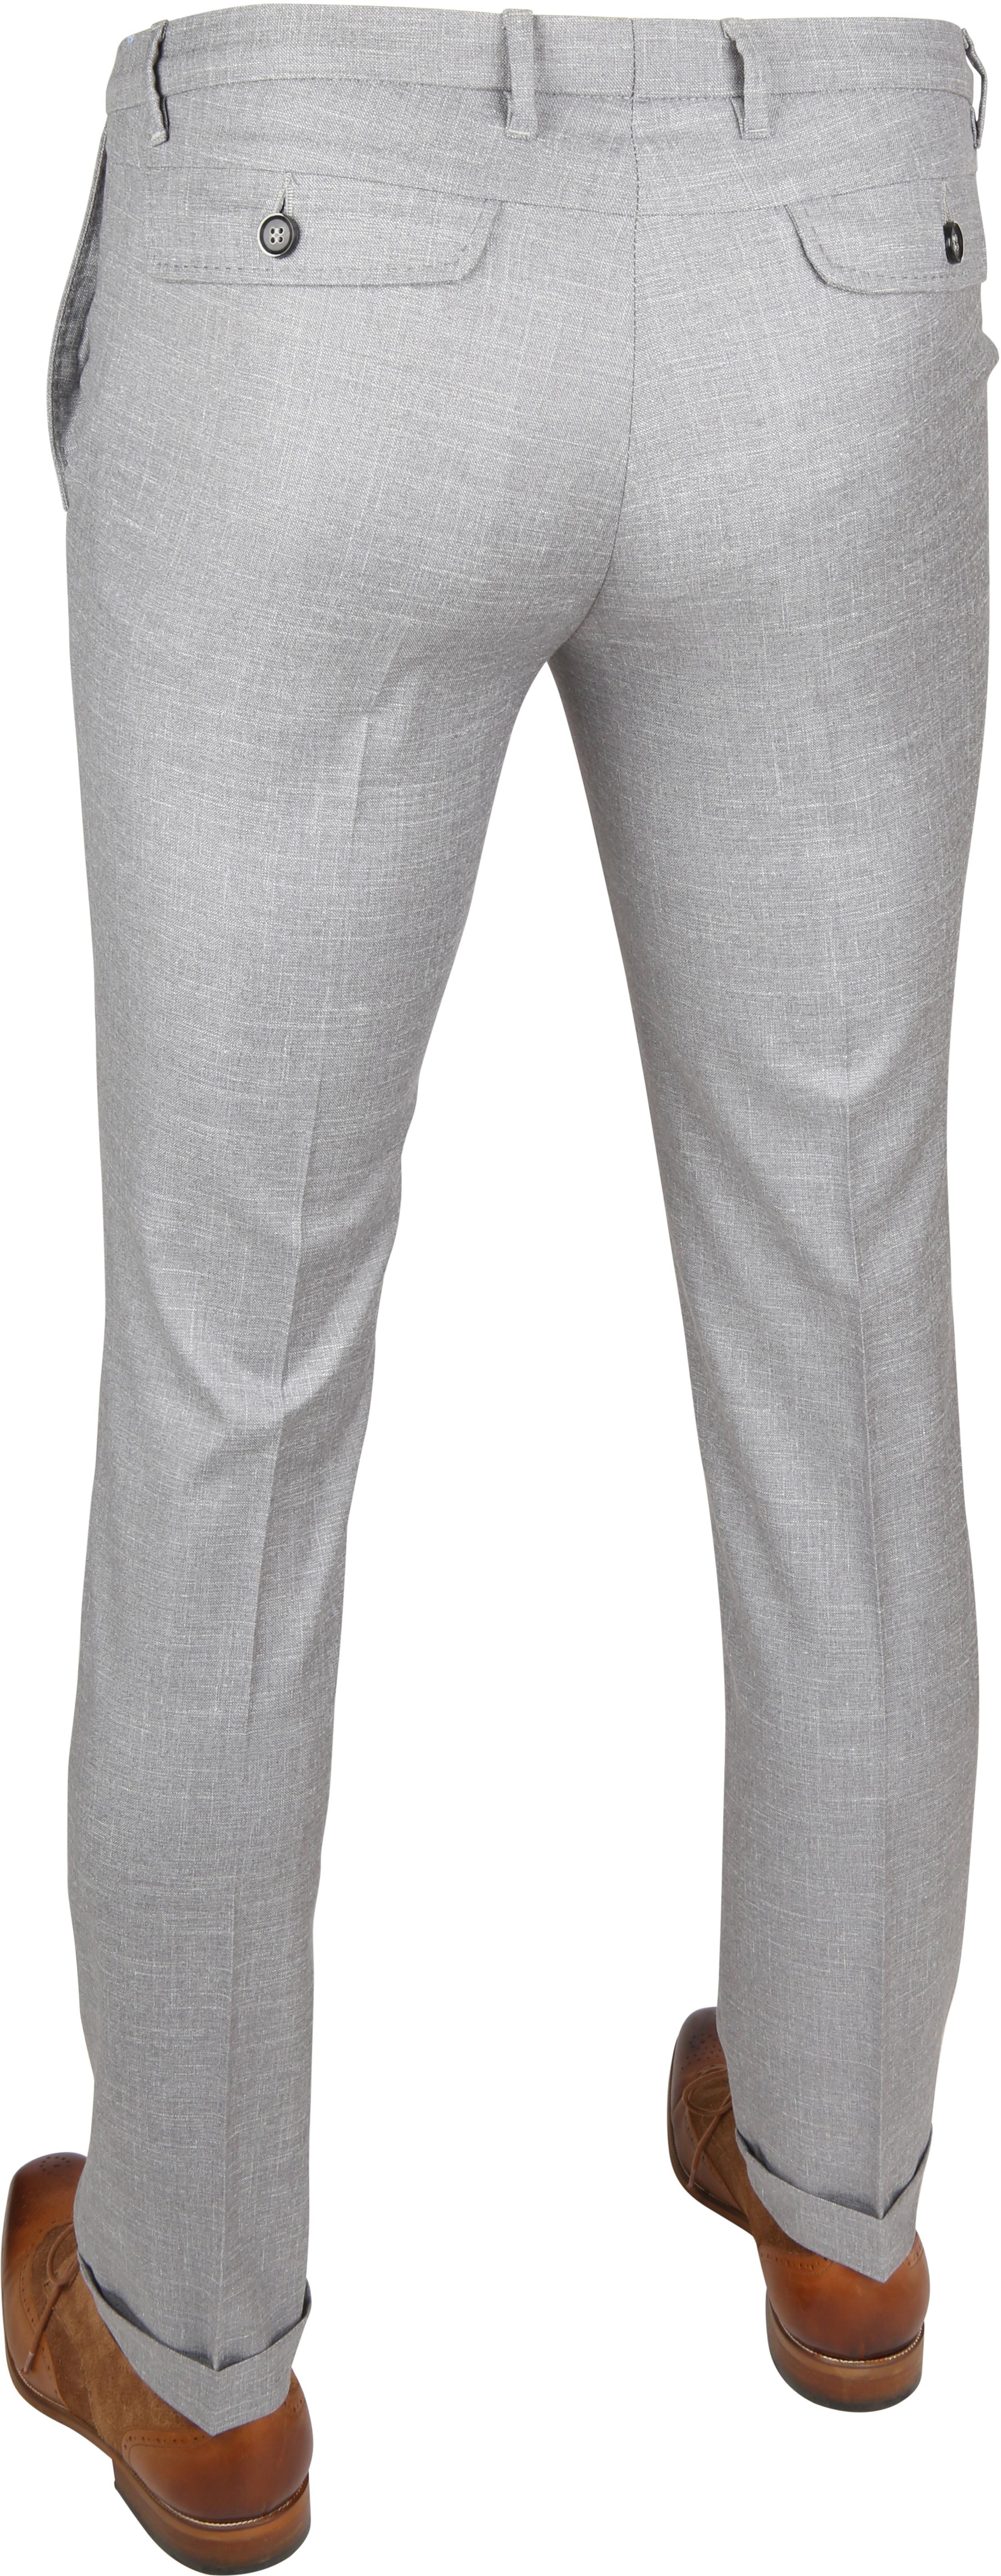 Suitable Pantalon Pisa Melange Grey foto 3